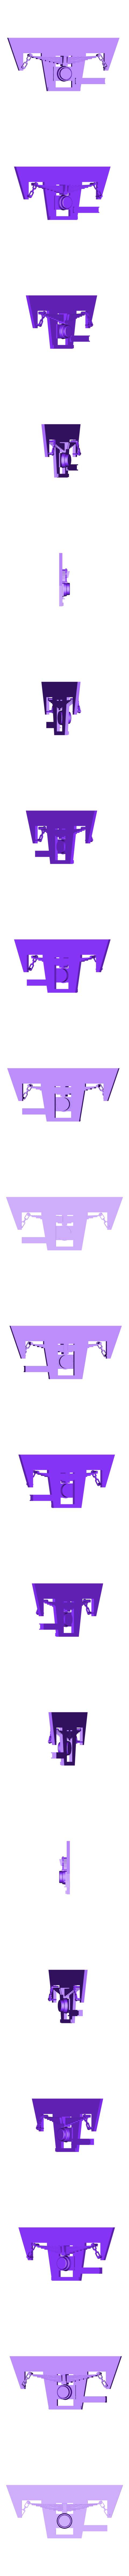 G boite essieu2.STL Download STL file Draisine Matisa for LGB • 3D printable object, biddle